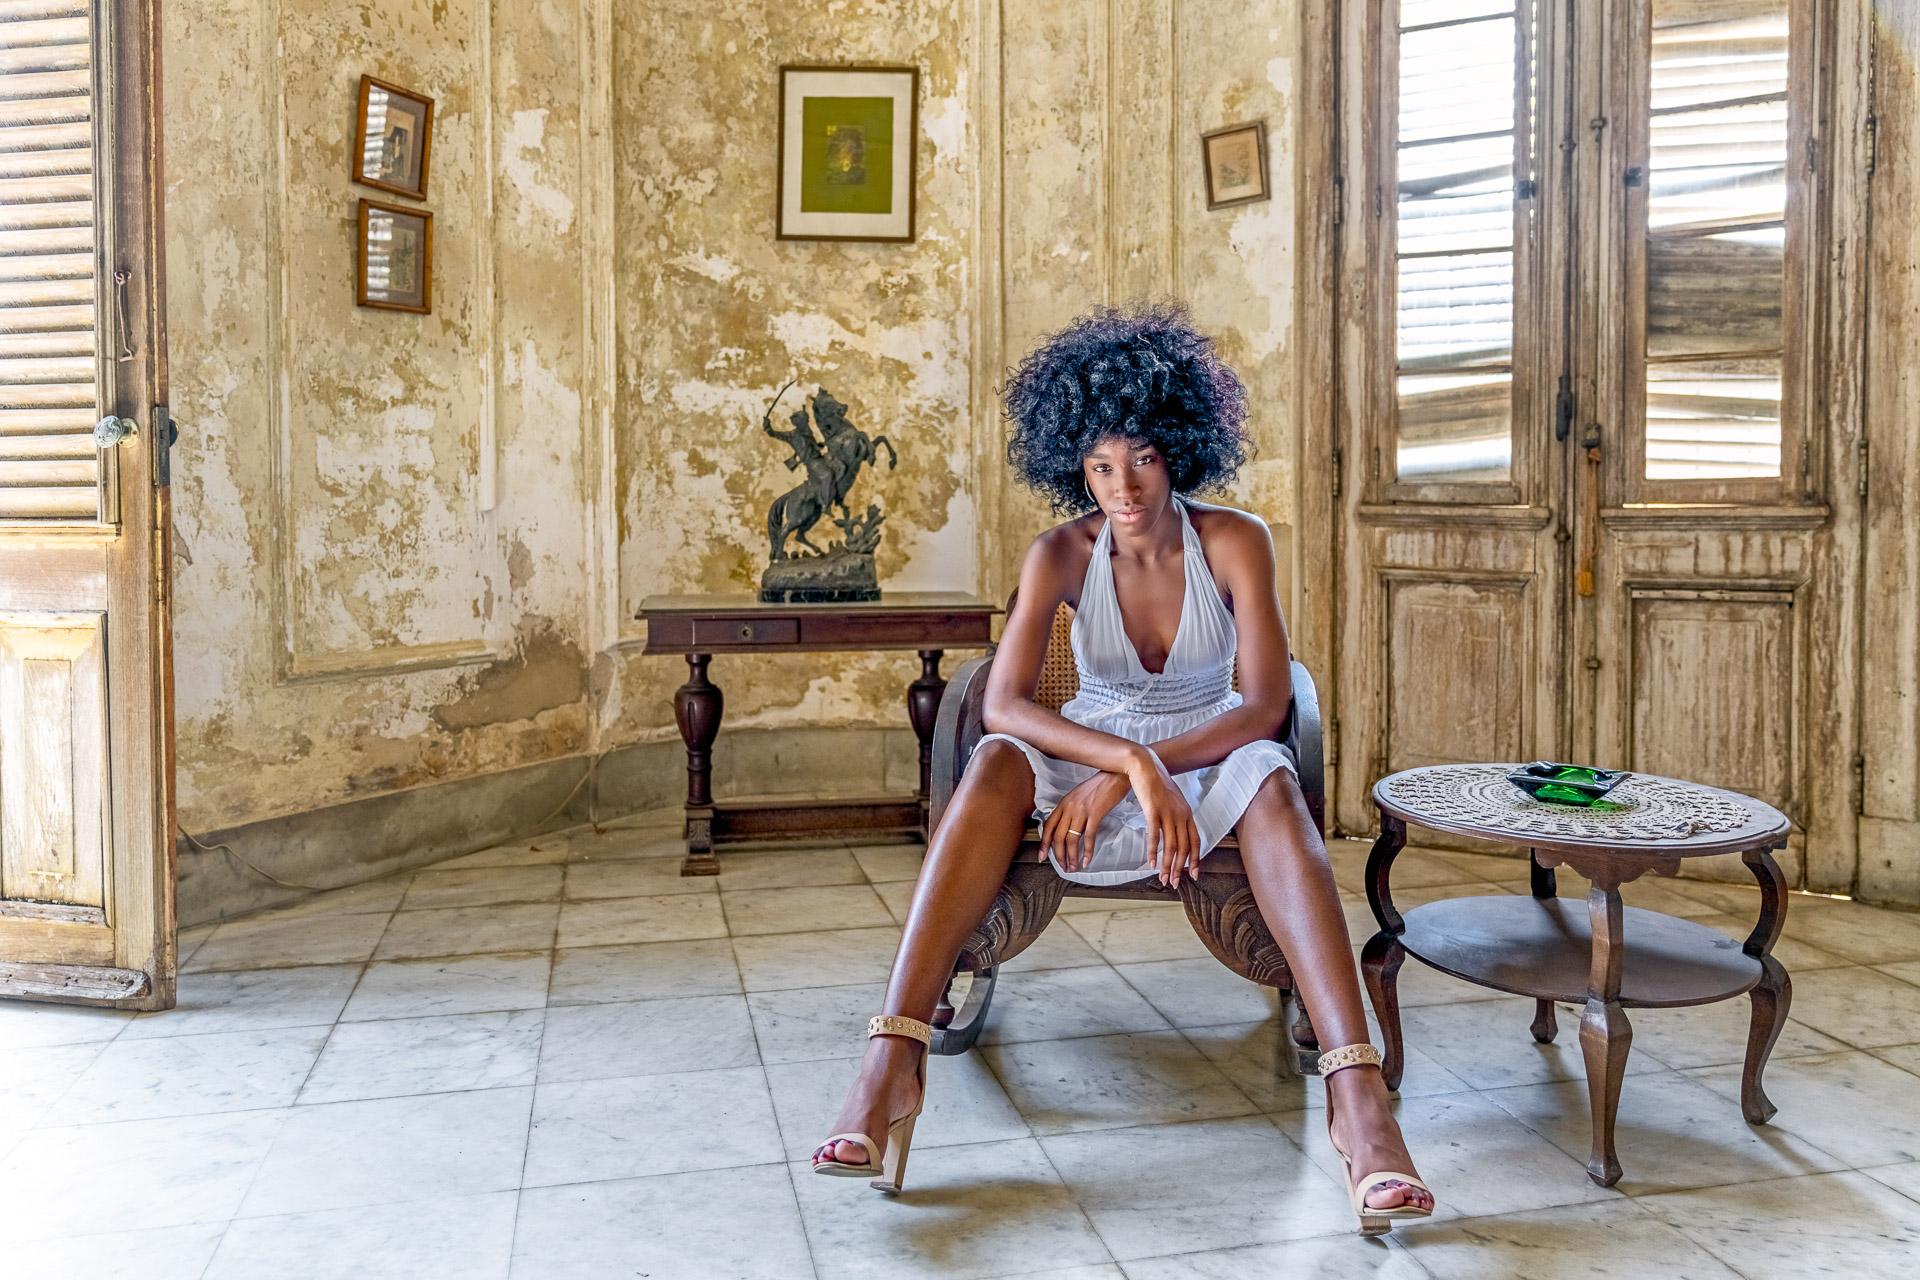 fotoreise-fotosafari-hd-2021-184-Kuba